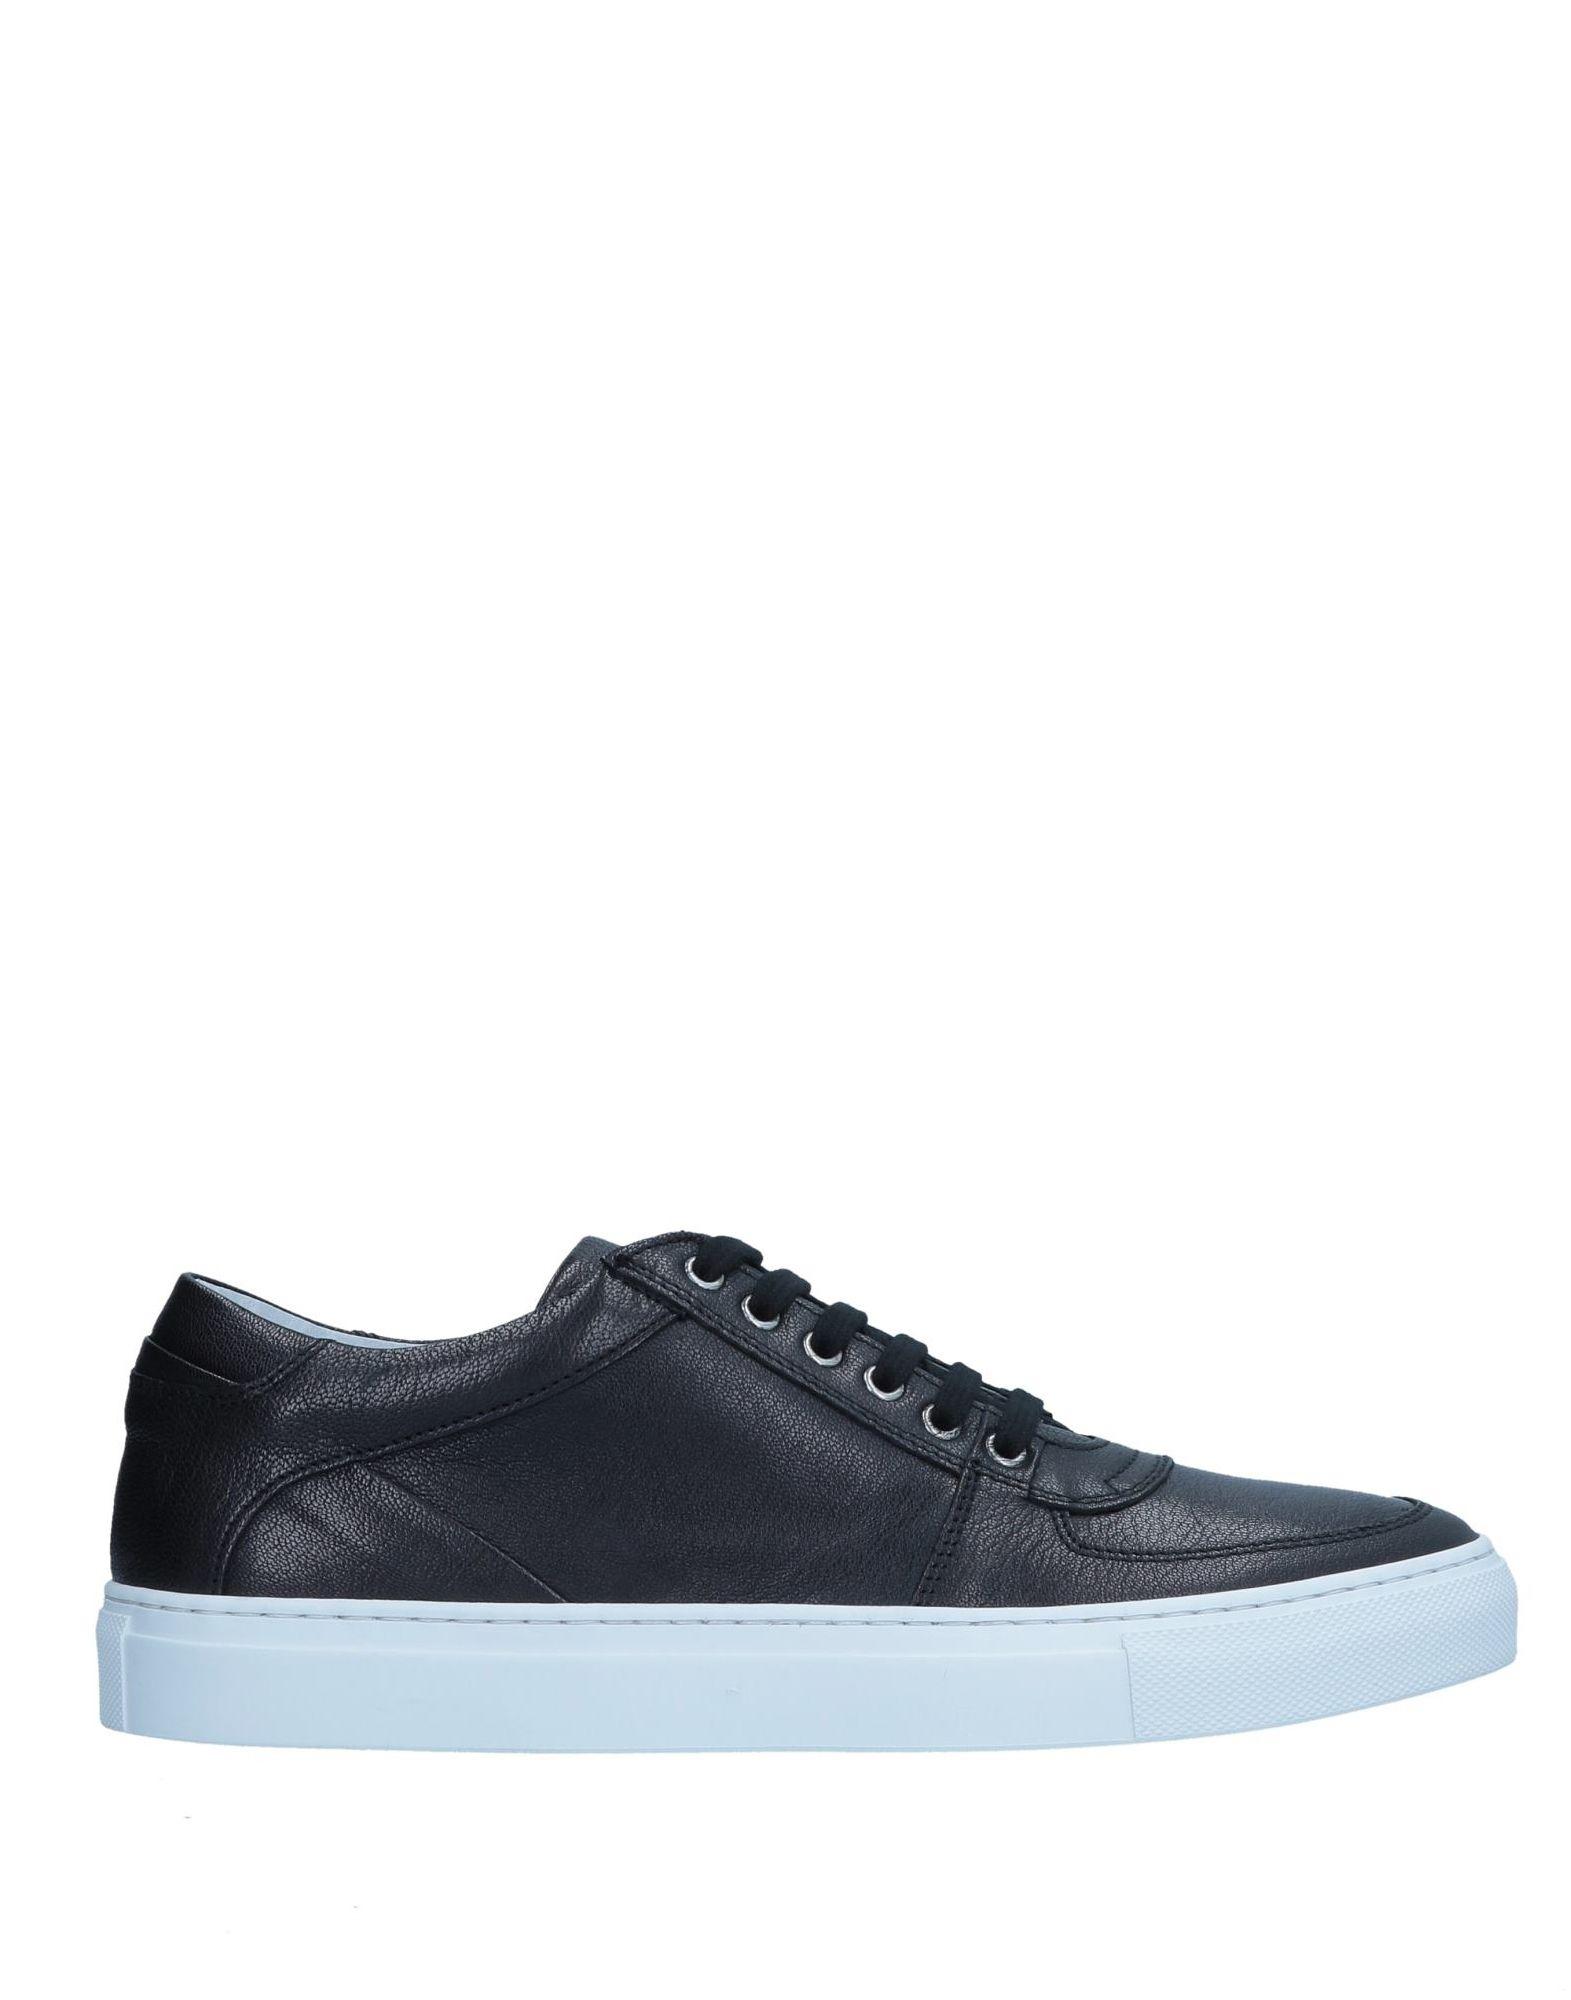 Fabiano Ricci Sneakers Herren  11547075OM Gute Qualität beliebte Schuhe